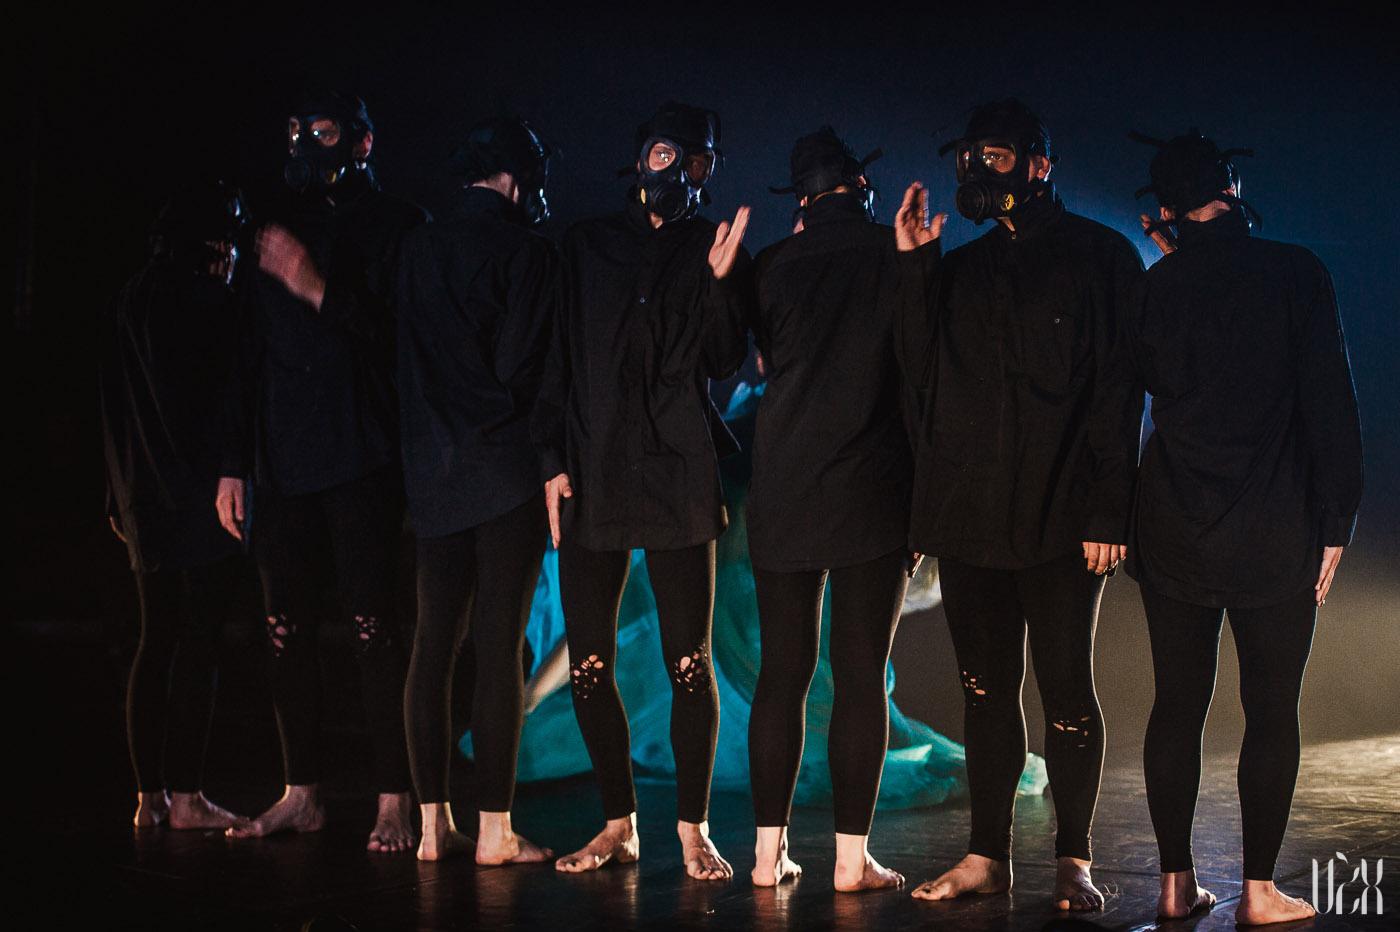 E.sabaliauskaite Vzx.lt Faustas Teatras Event 023